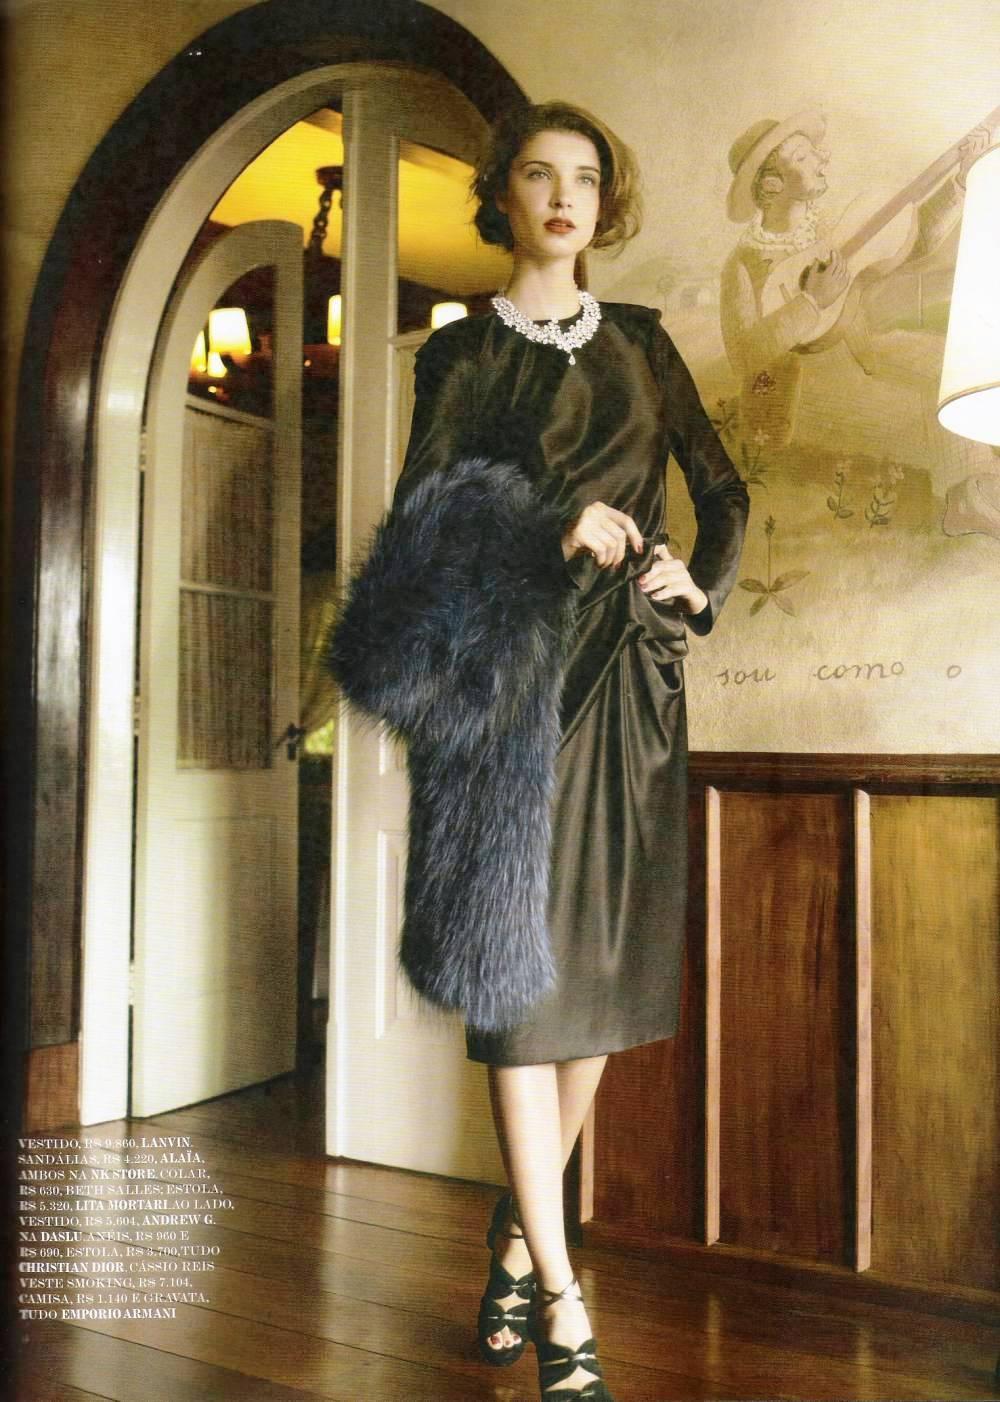 Belle vivir interior design blog lifestyle home decor glamour at